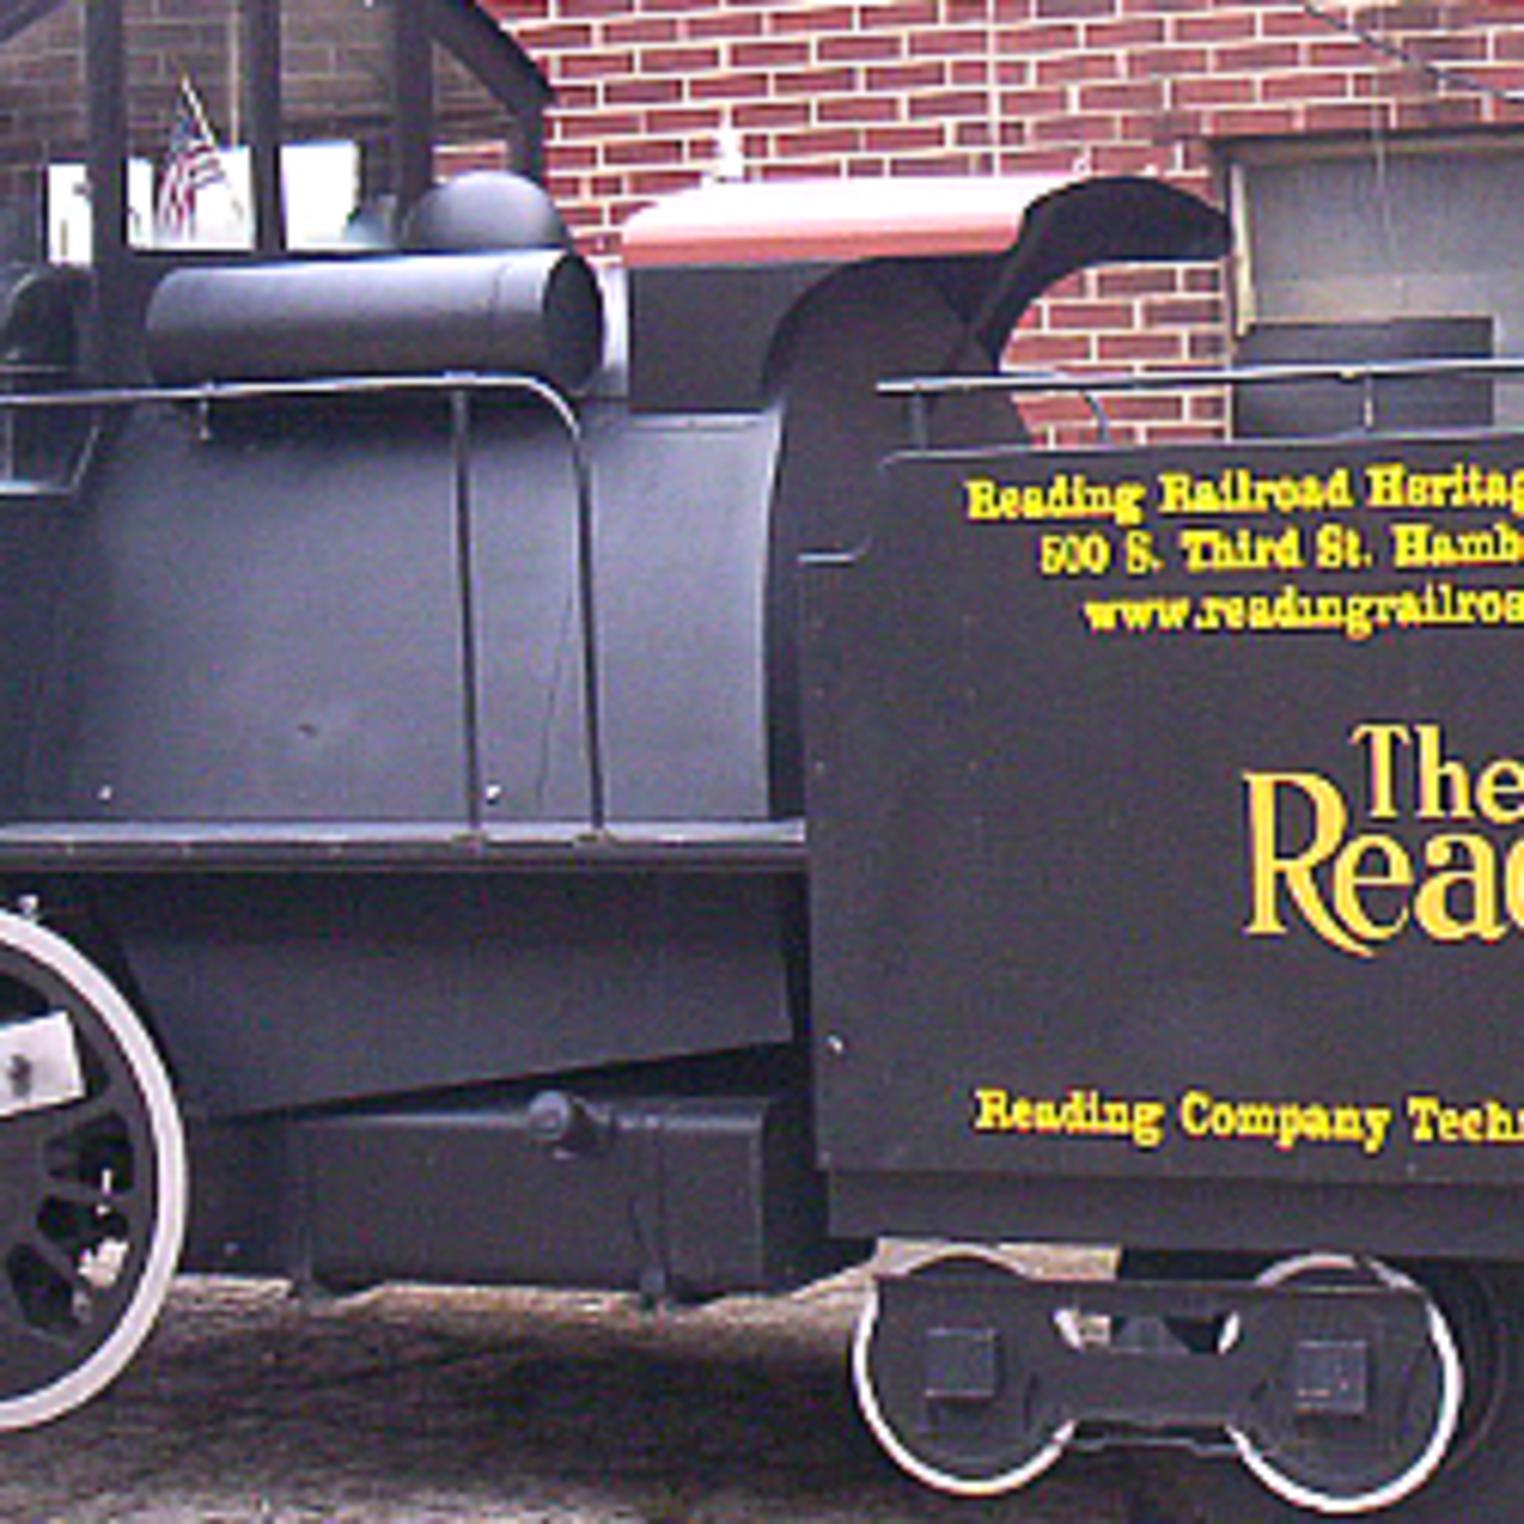 Reading Railroad Heritage Museum